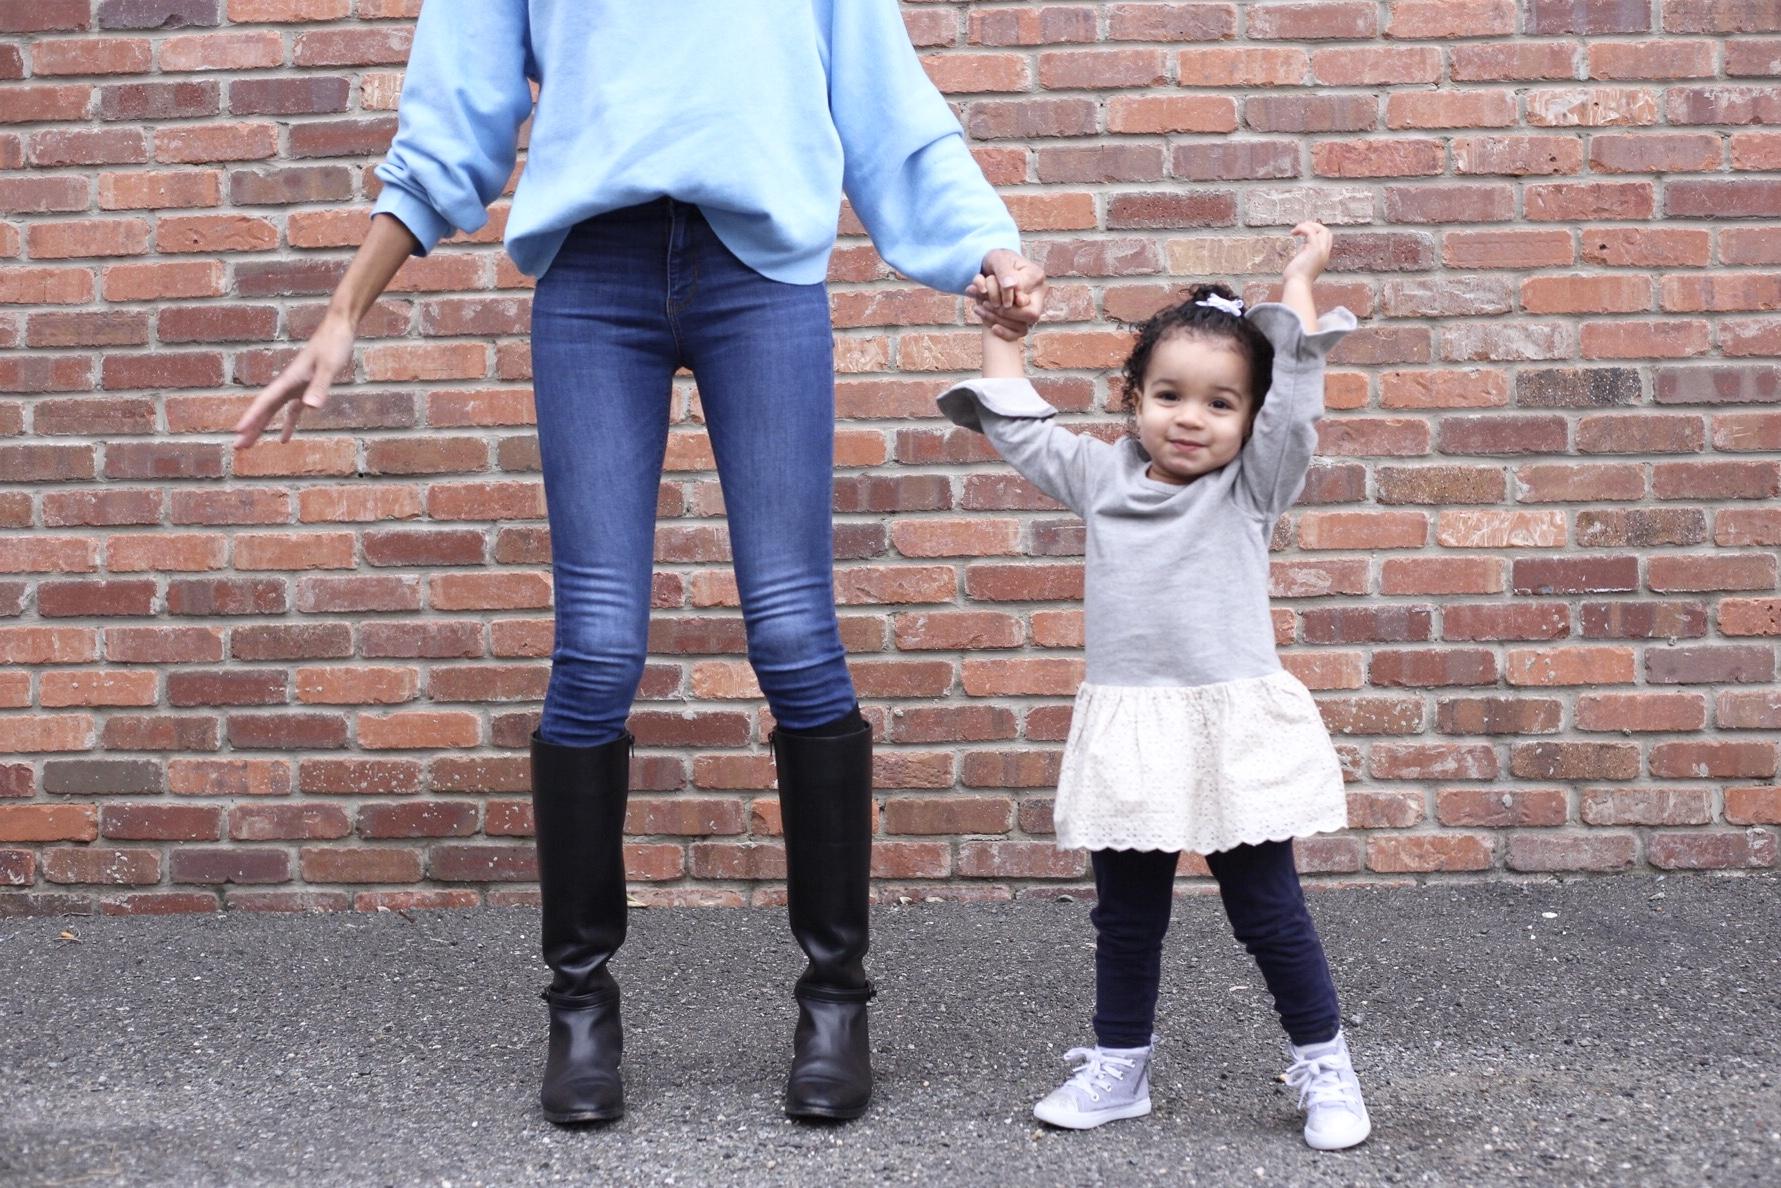 2 year old milestones, baby gap style, toddler milestones, baby outfits, baby update, mom life baby update, toddler update